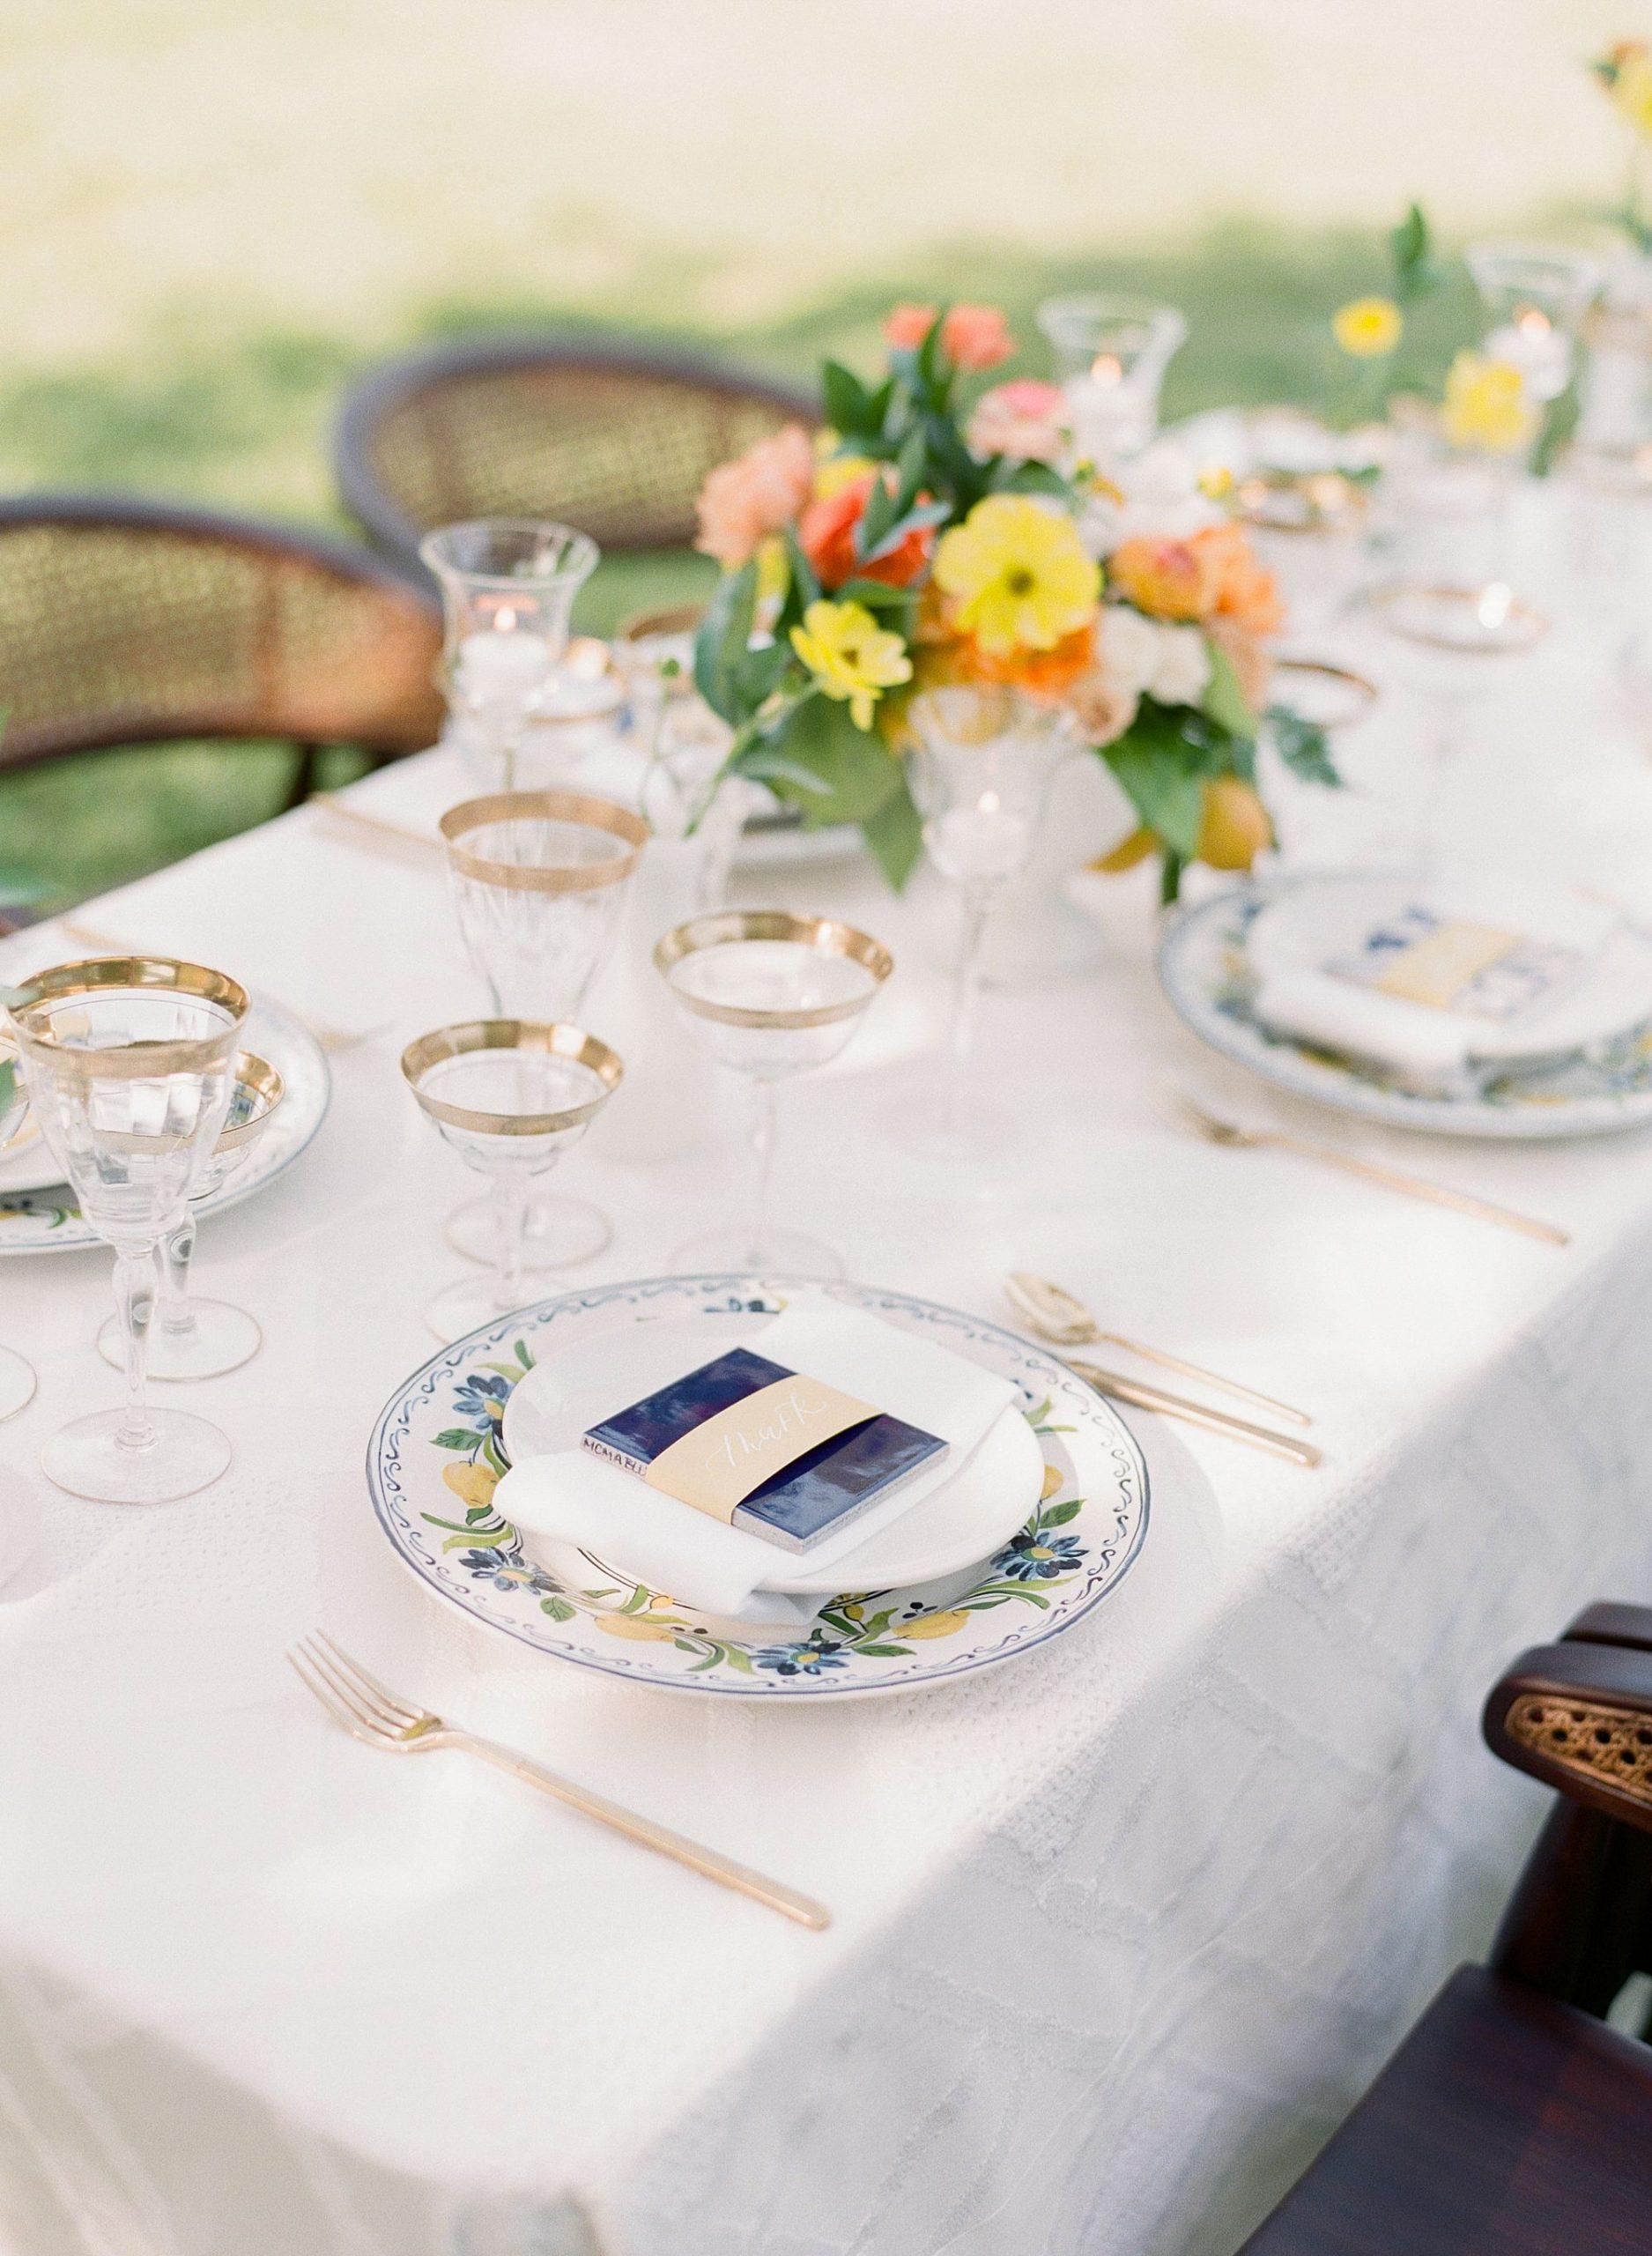 Italian Wedding Inspiration at The Maples Wedding & Event Center - Featured on Wedding Chicks - Ashley Baumgartner - Sacramento Wedding Phtoographer_0041.jpg